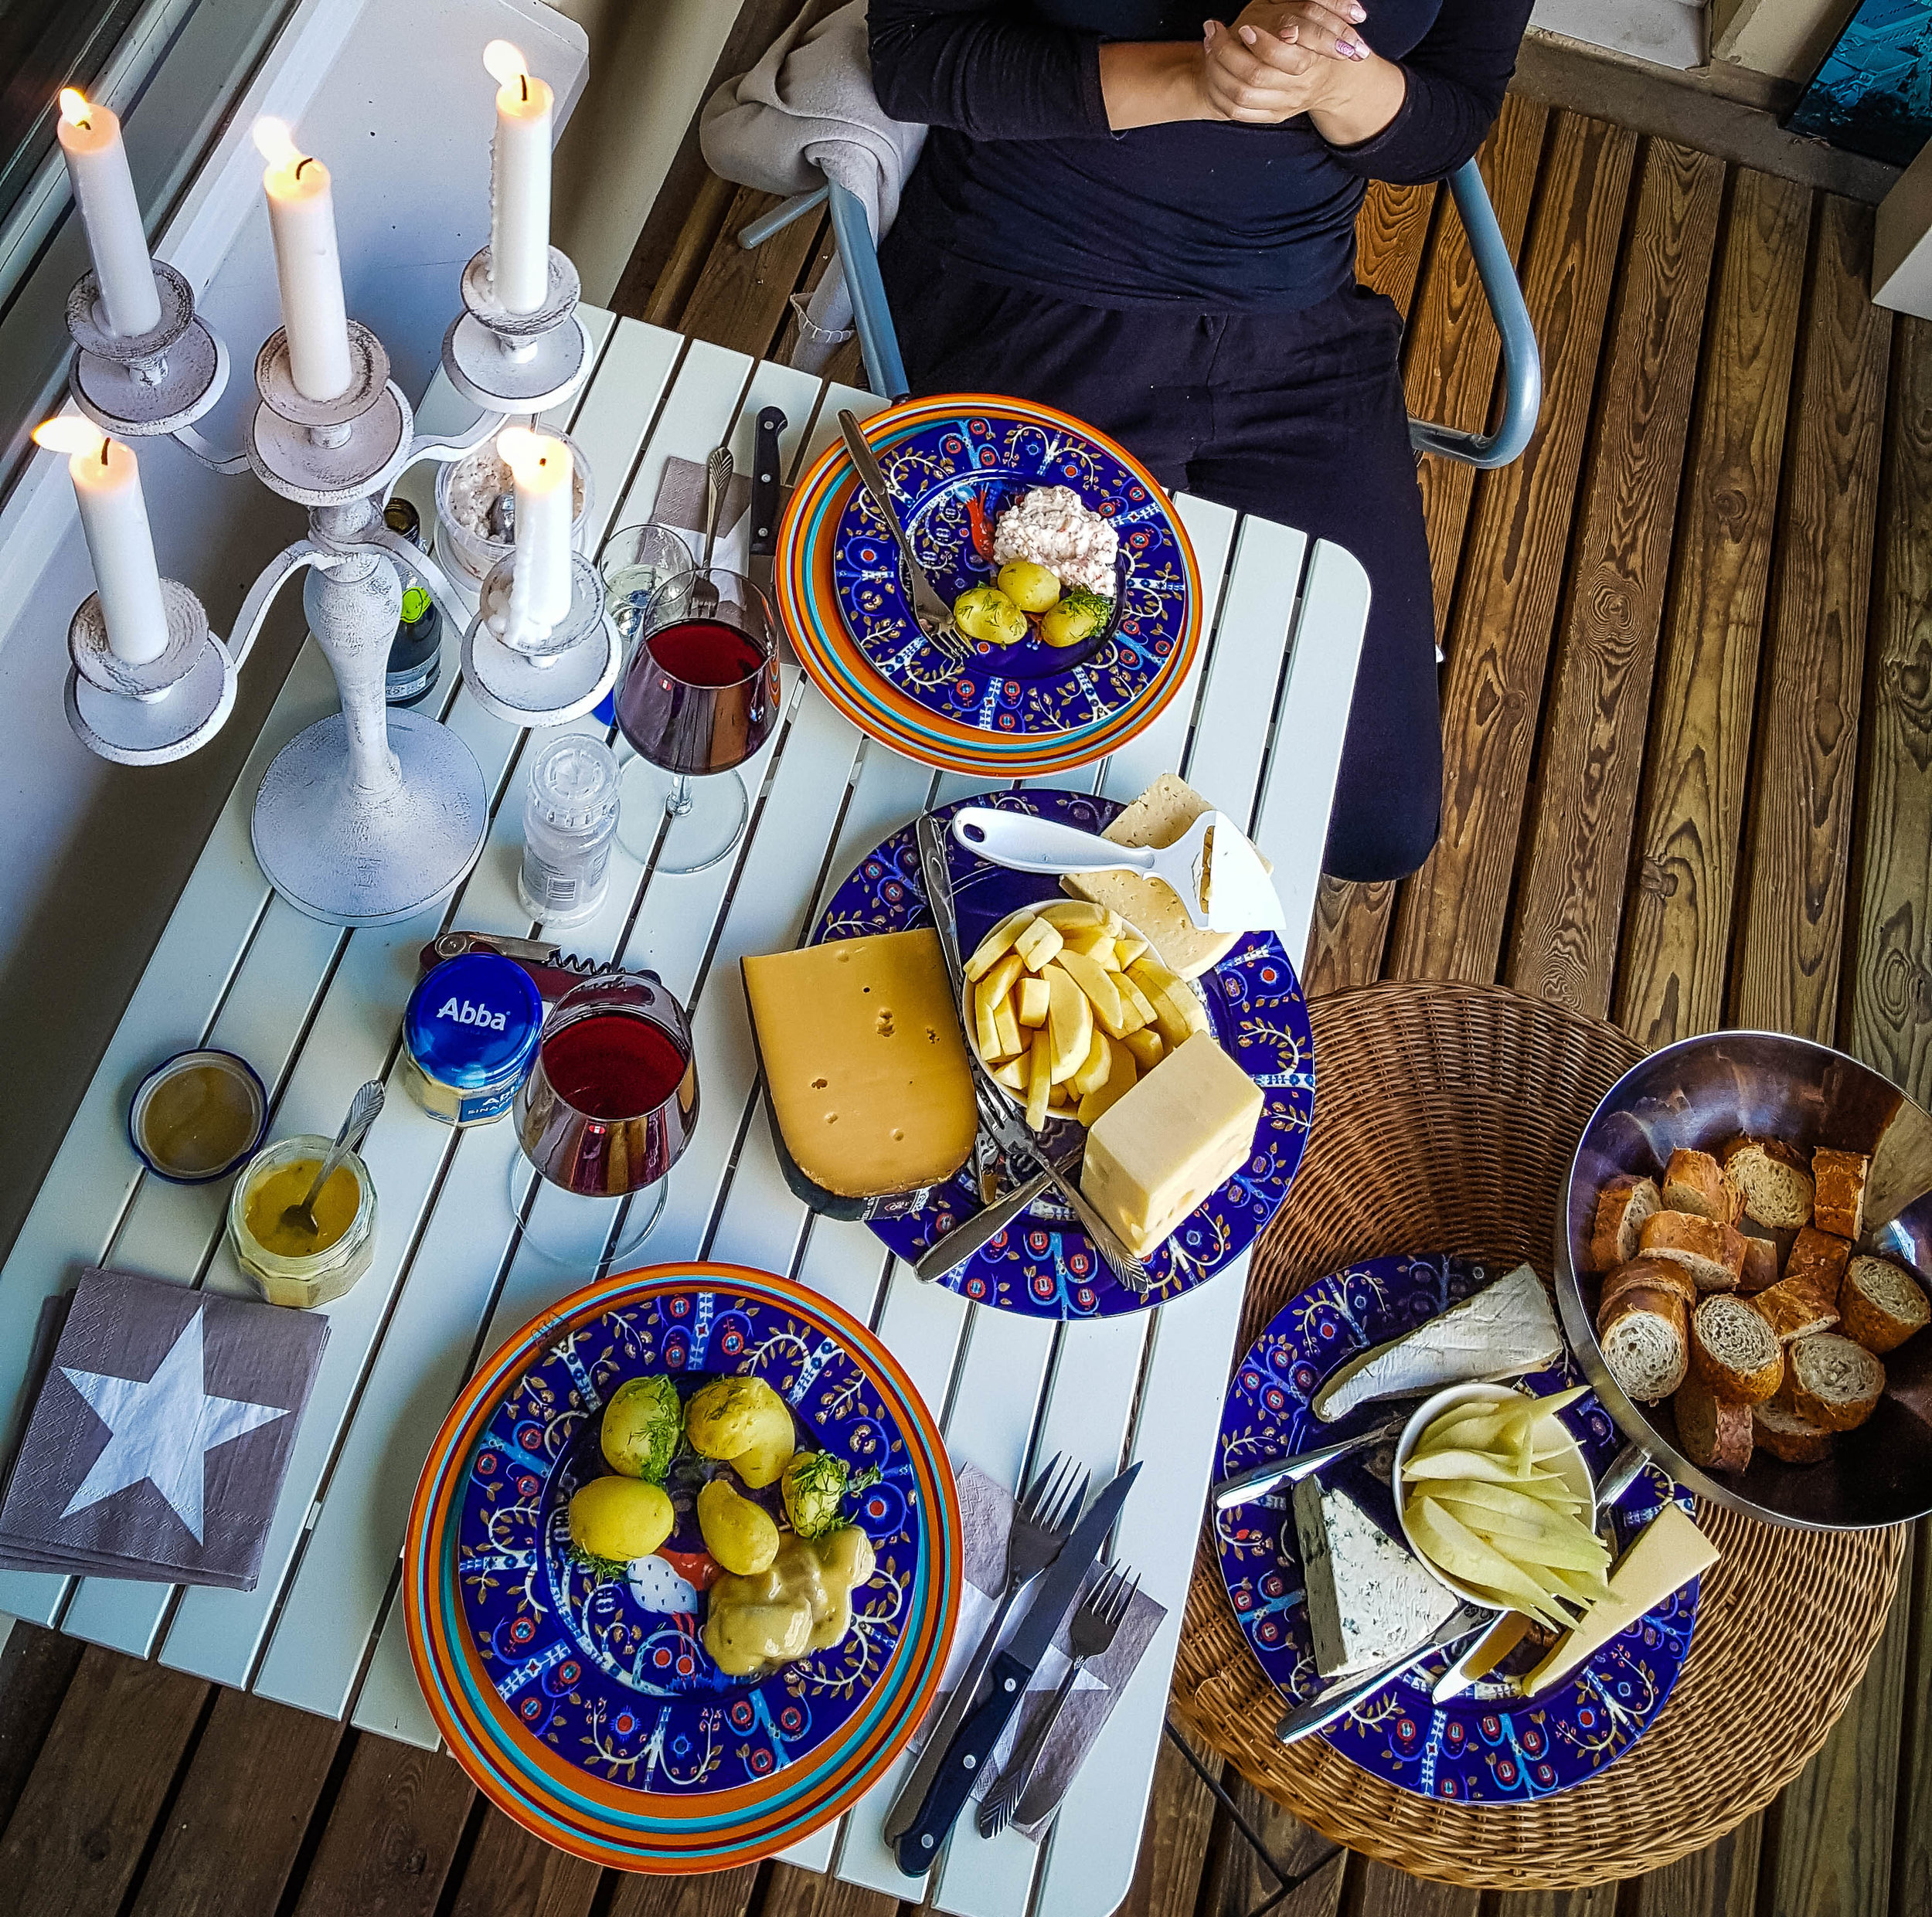 Enjoying food and wine on the balcony